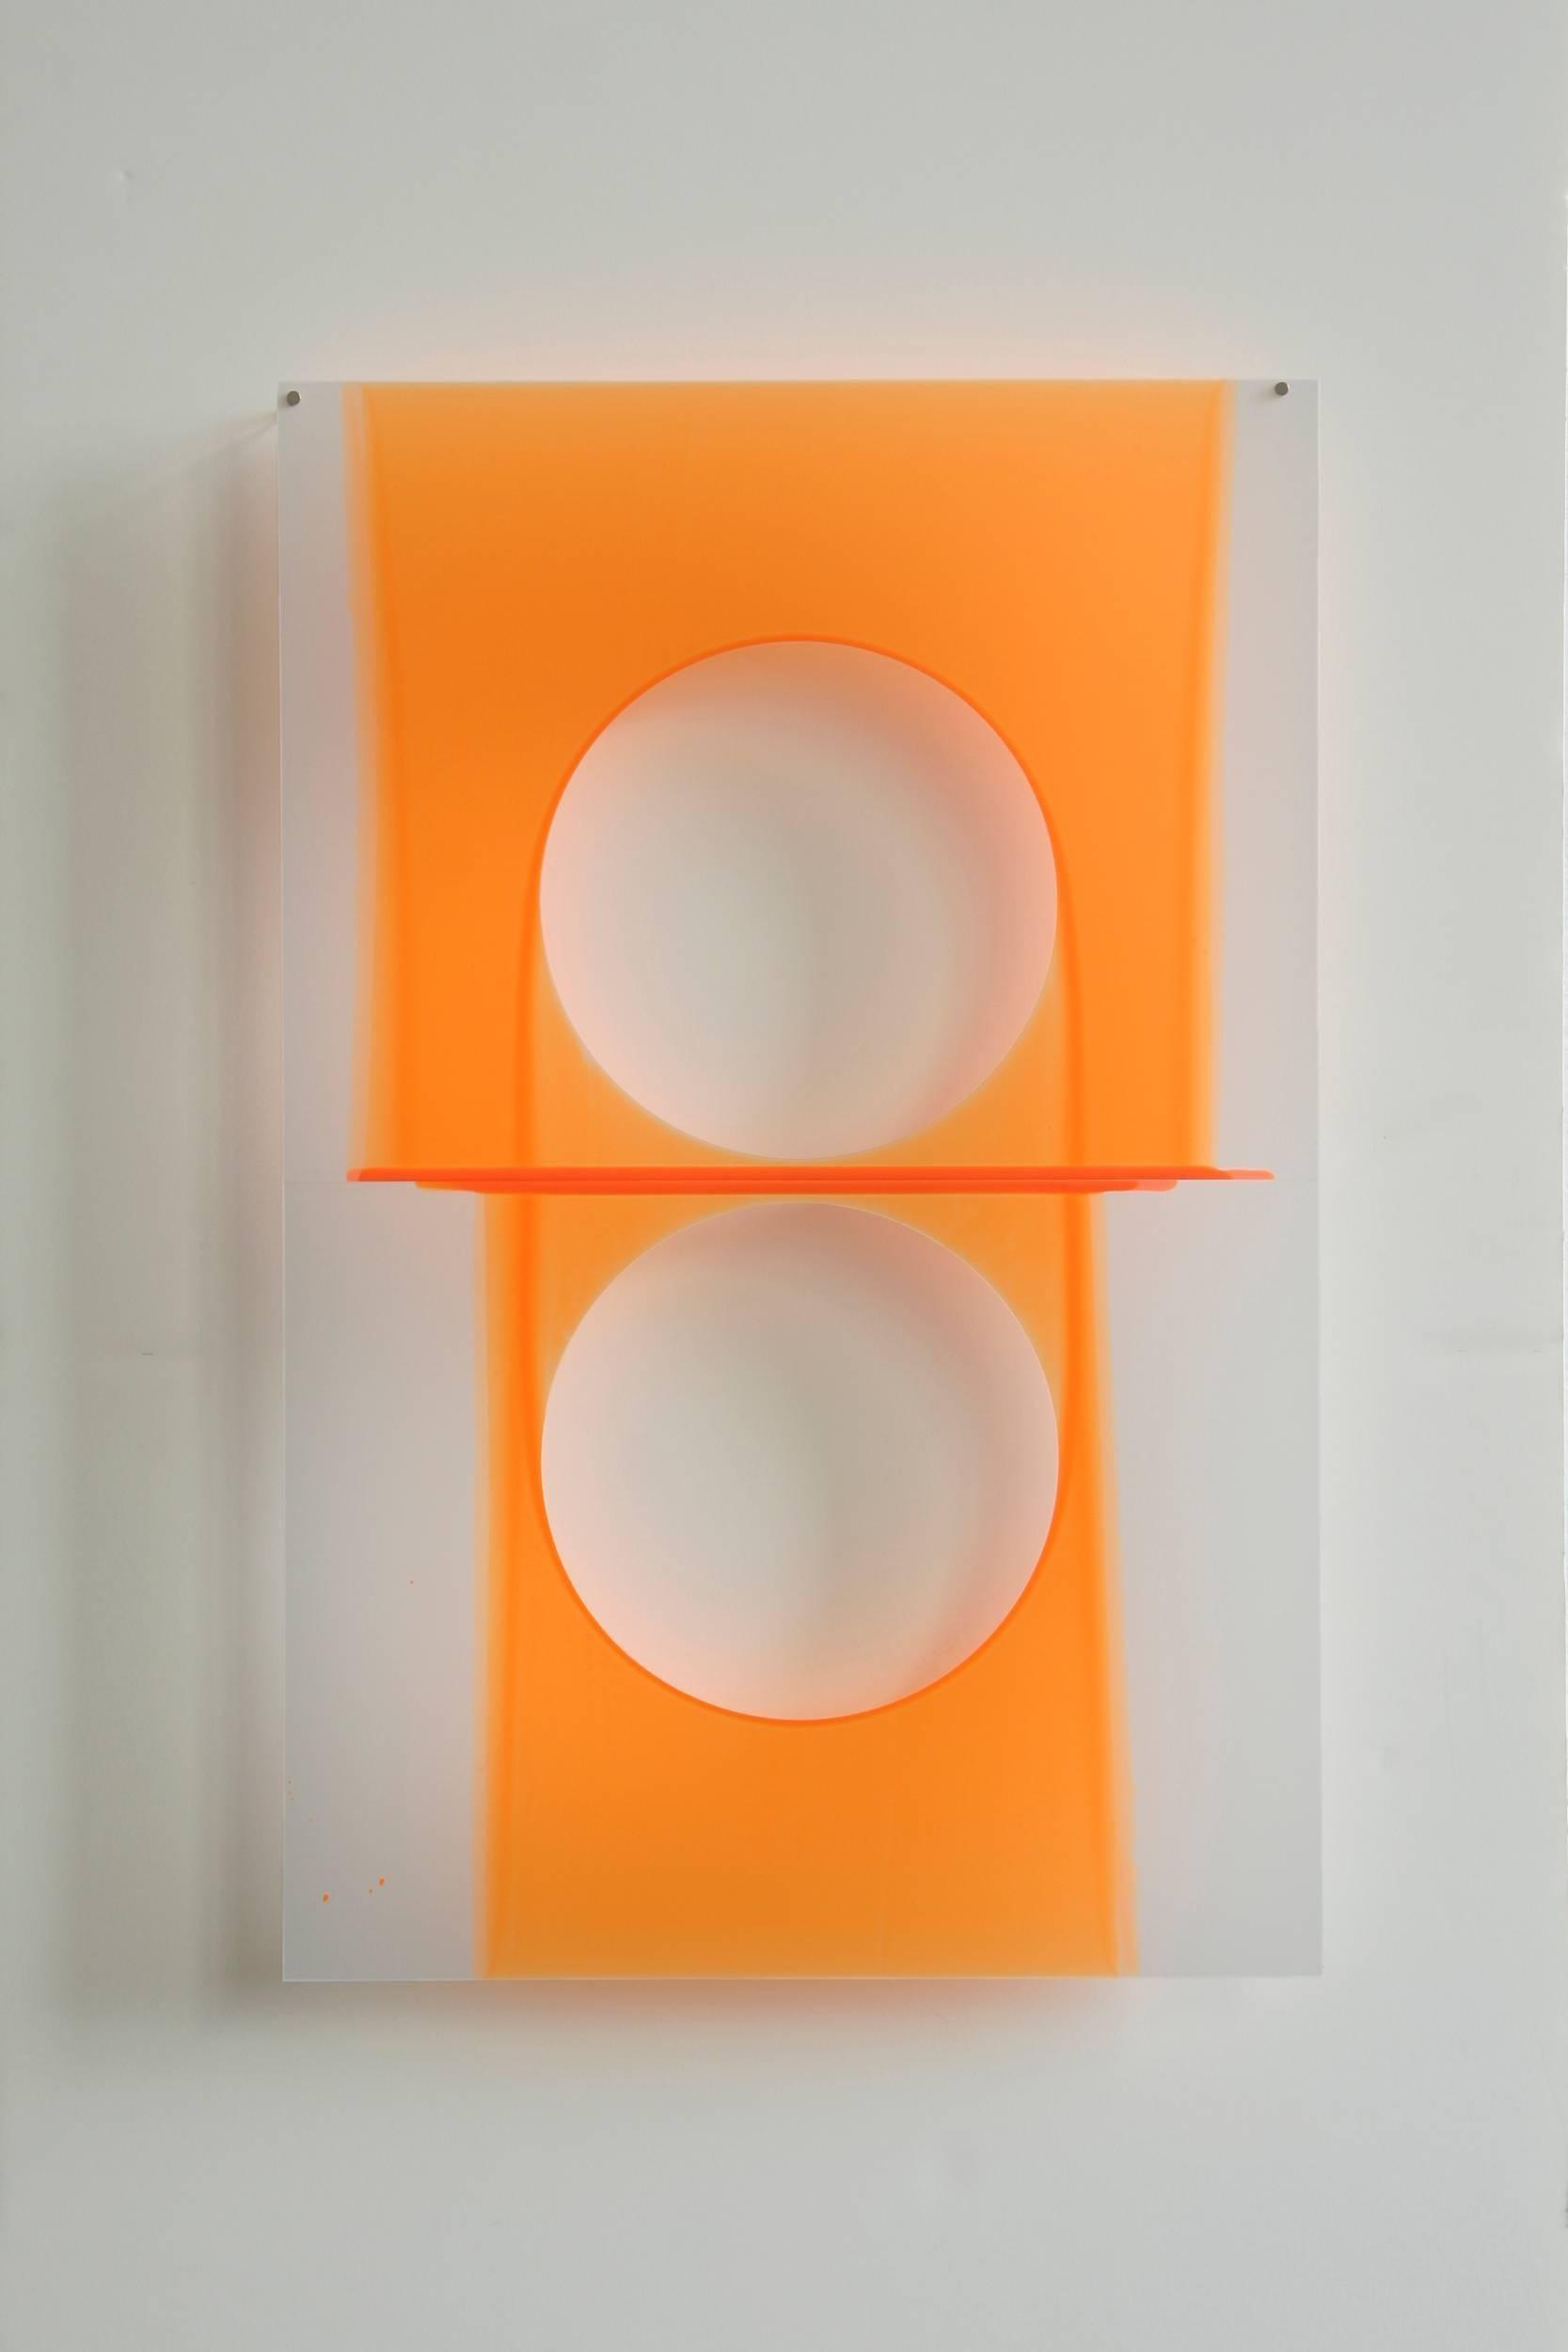 Mary Schiliro, Quick Dip, 2012, Painting, Acrylic on Mylar , Abstract Sculpture